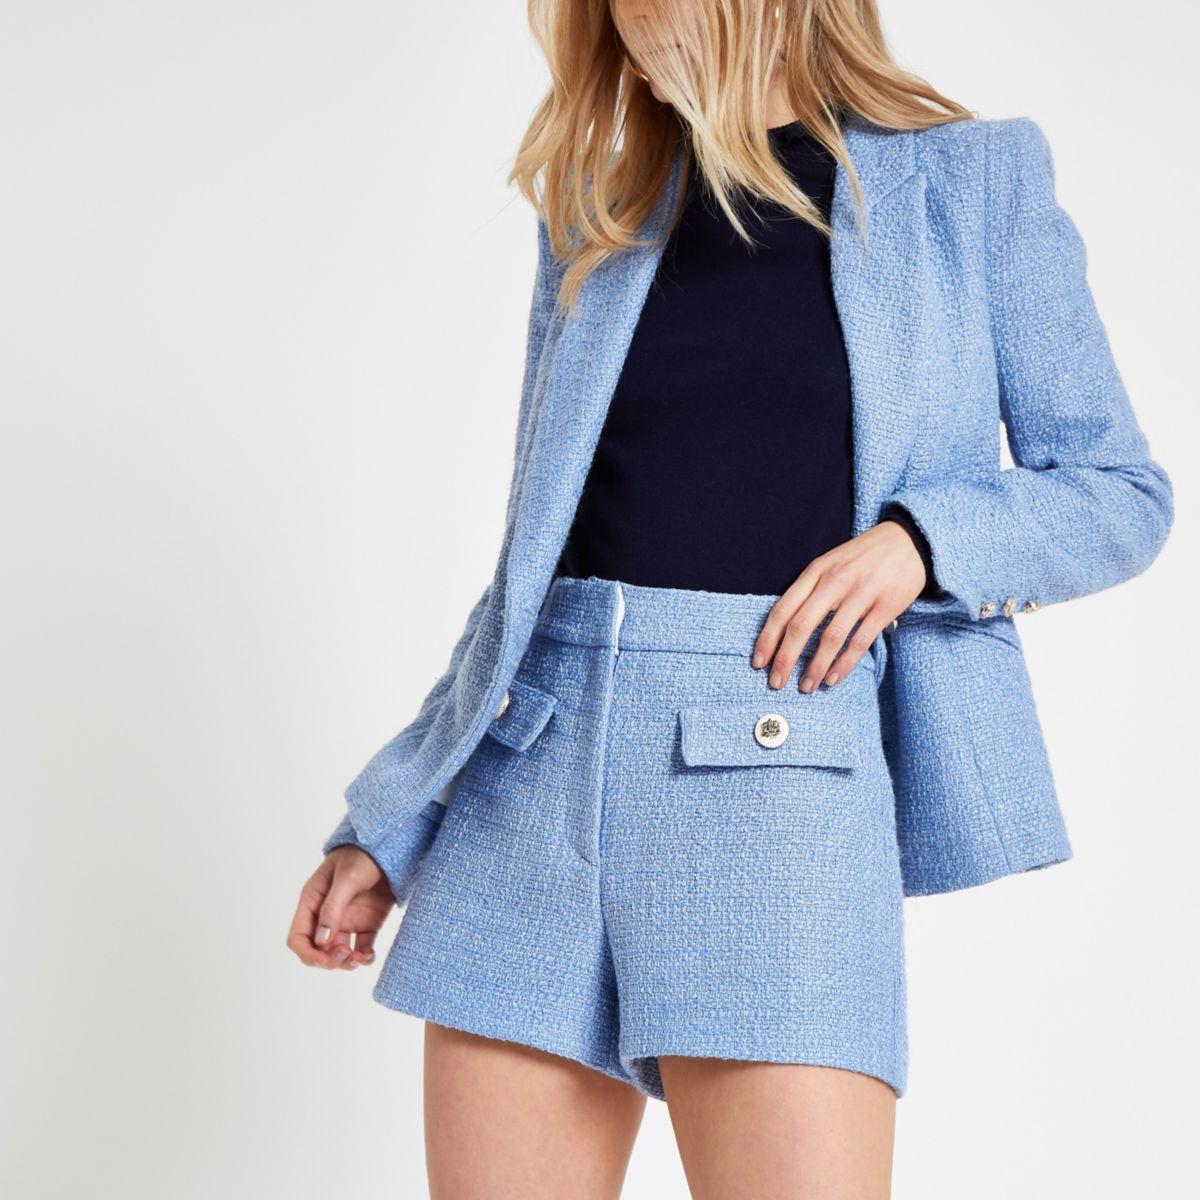 Blue button detail shorts